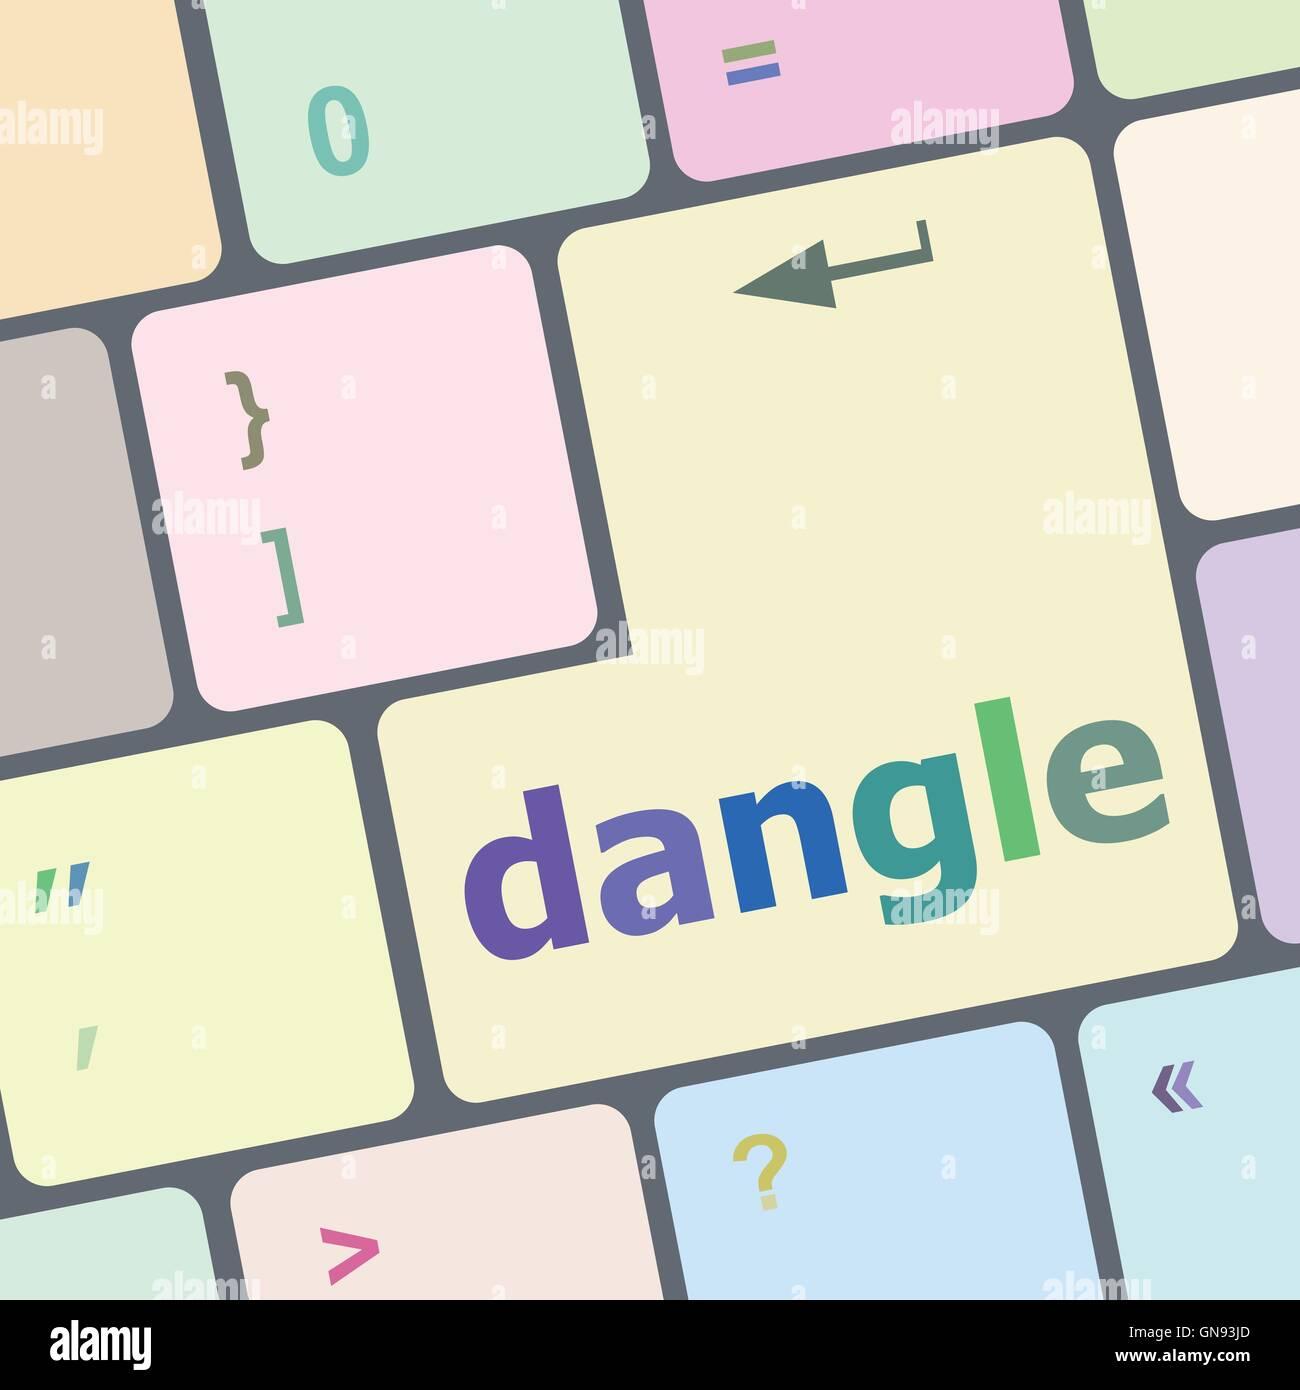 dangle word on computer keyboard key vector illustration - Stock Image